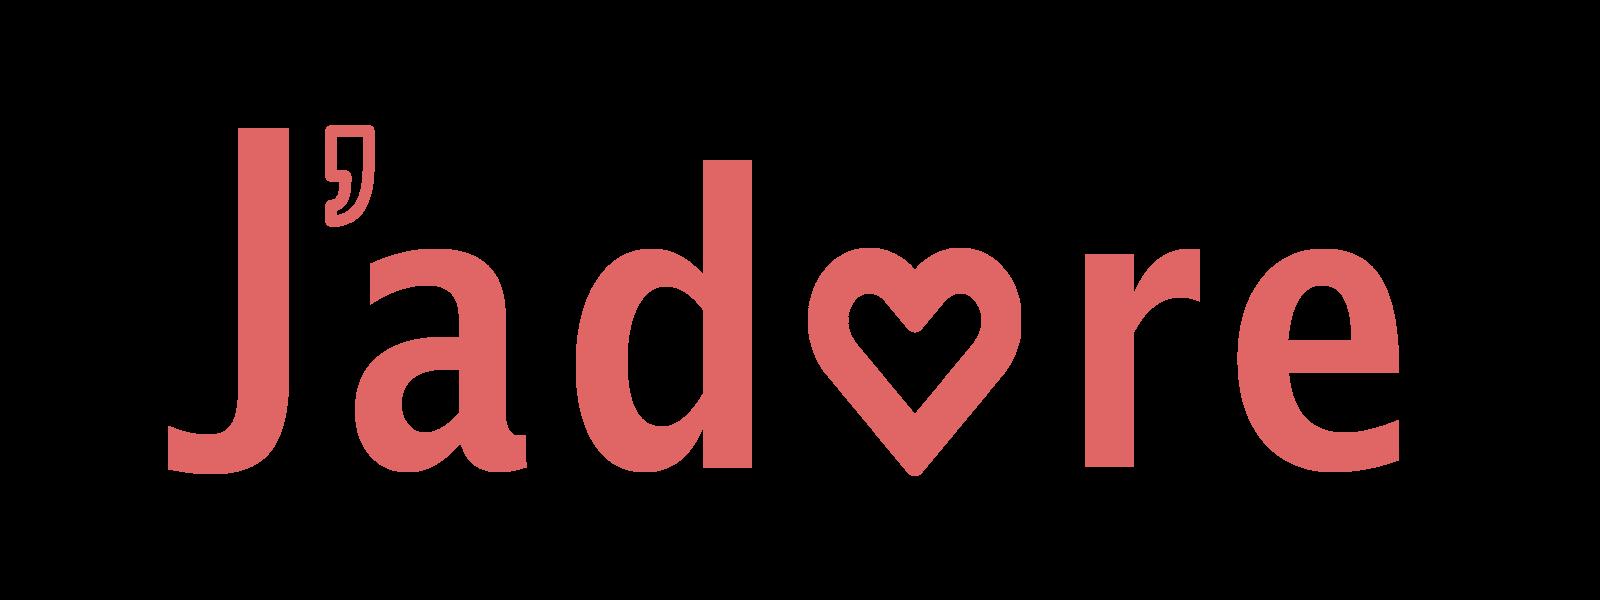 Jadore corporate logo